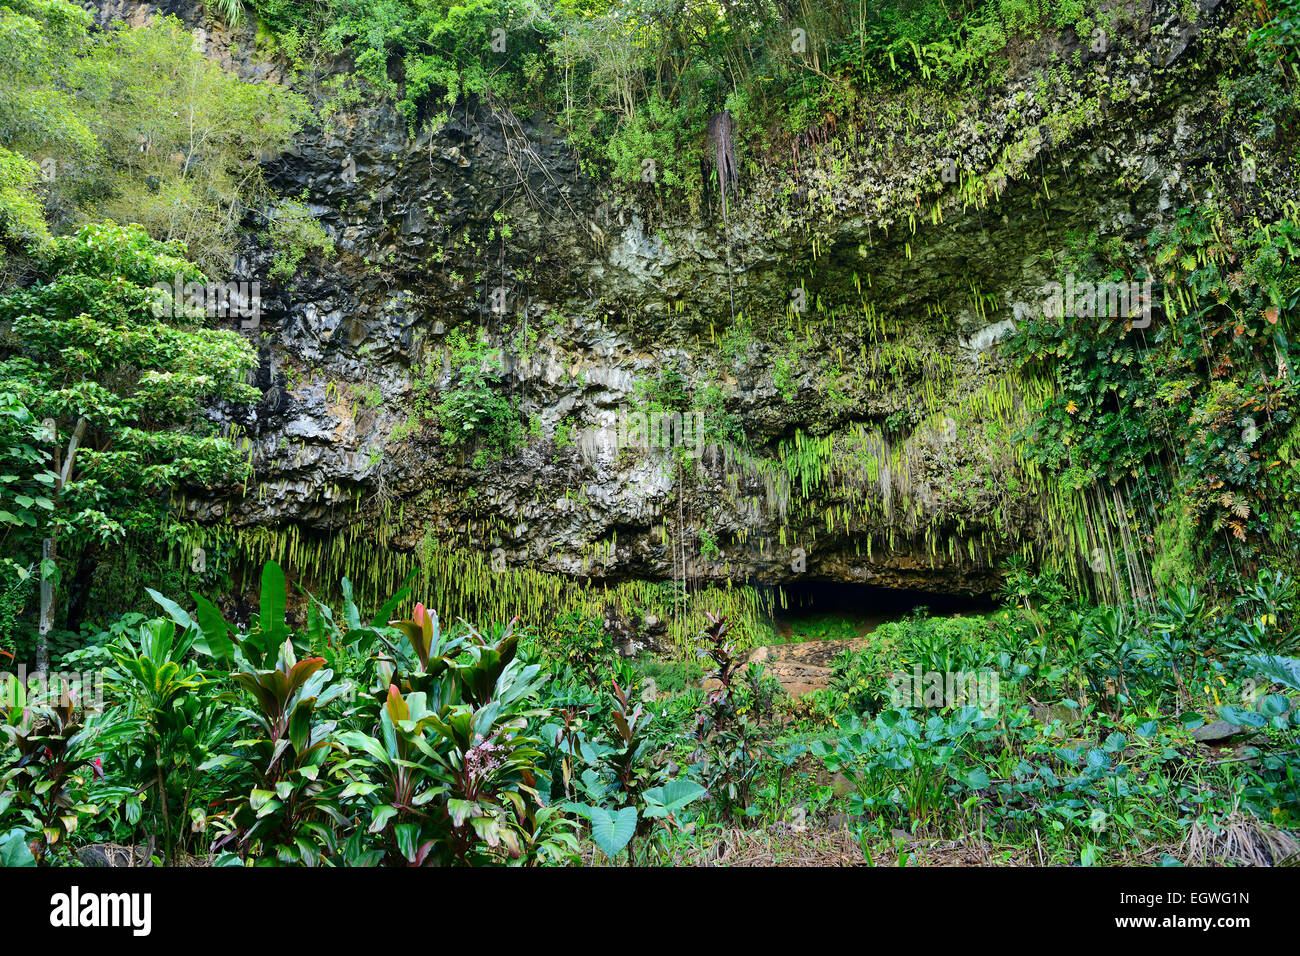 Fern Grotto en Wailua River State Park, Kauai, Hawaii, EE.UU. Foto de stock